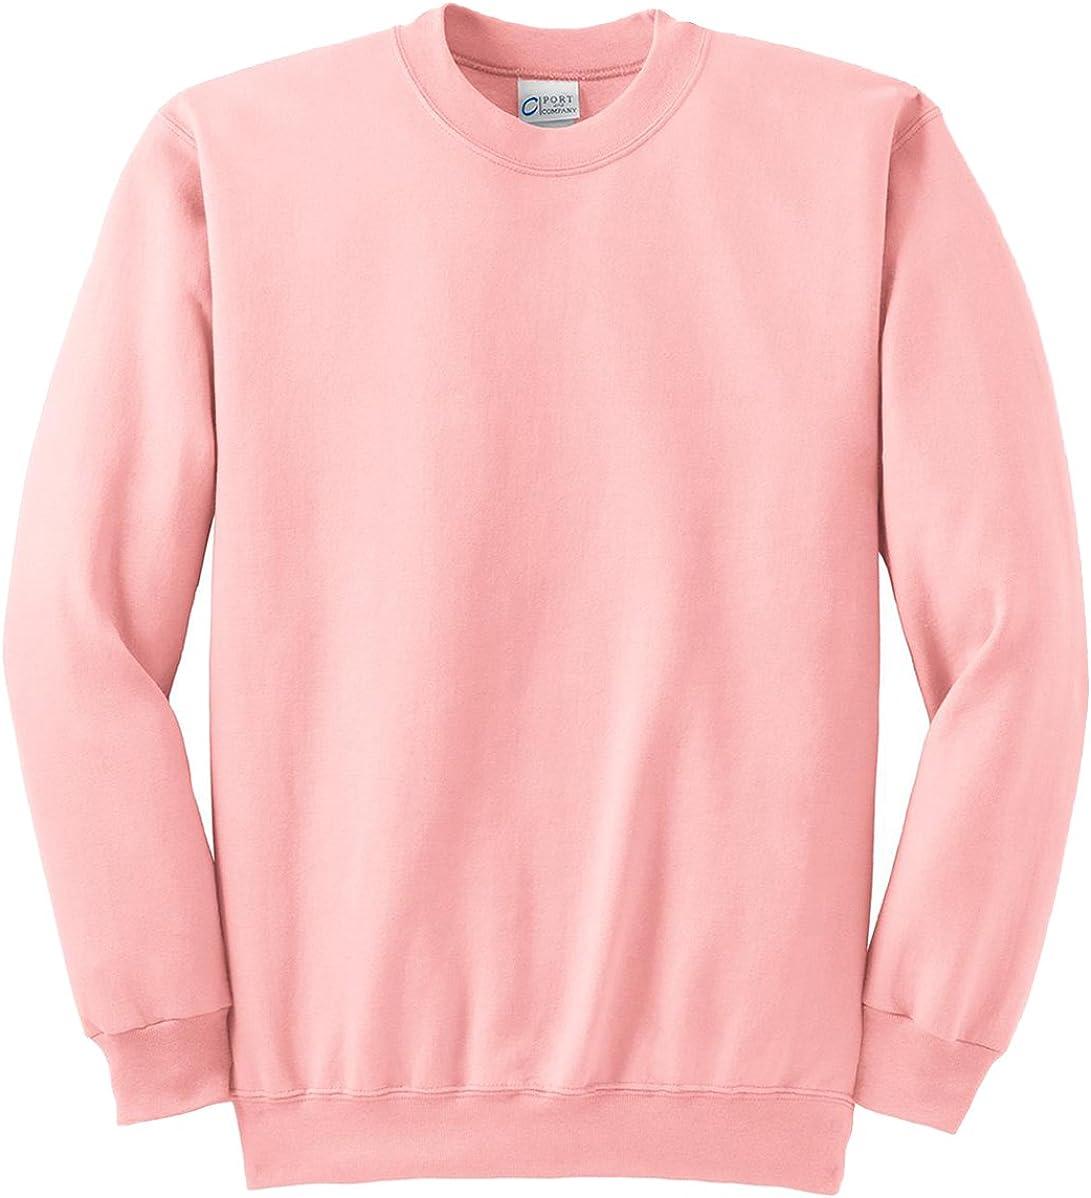 Port & Company Tall Ultimate Crewneck Sweatshirt. PC90T XX-Large Tall Pale Pink